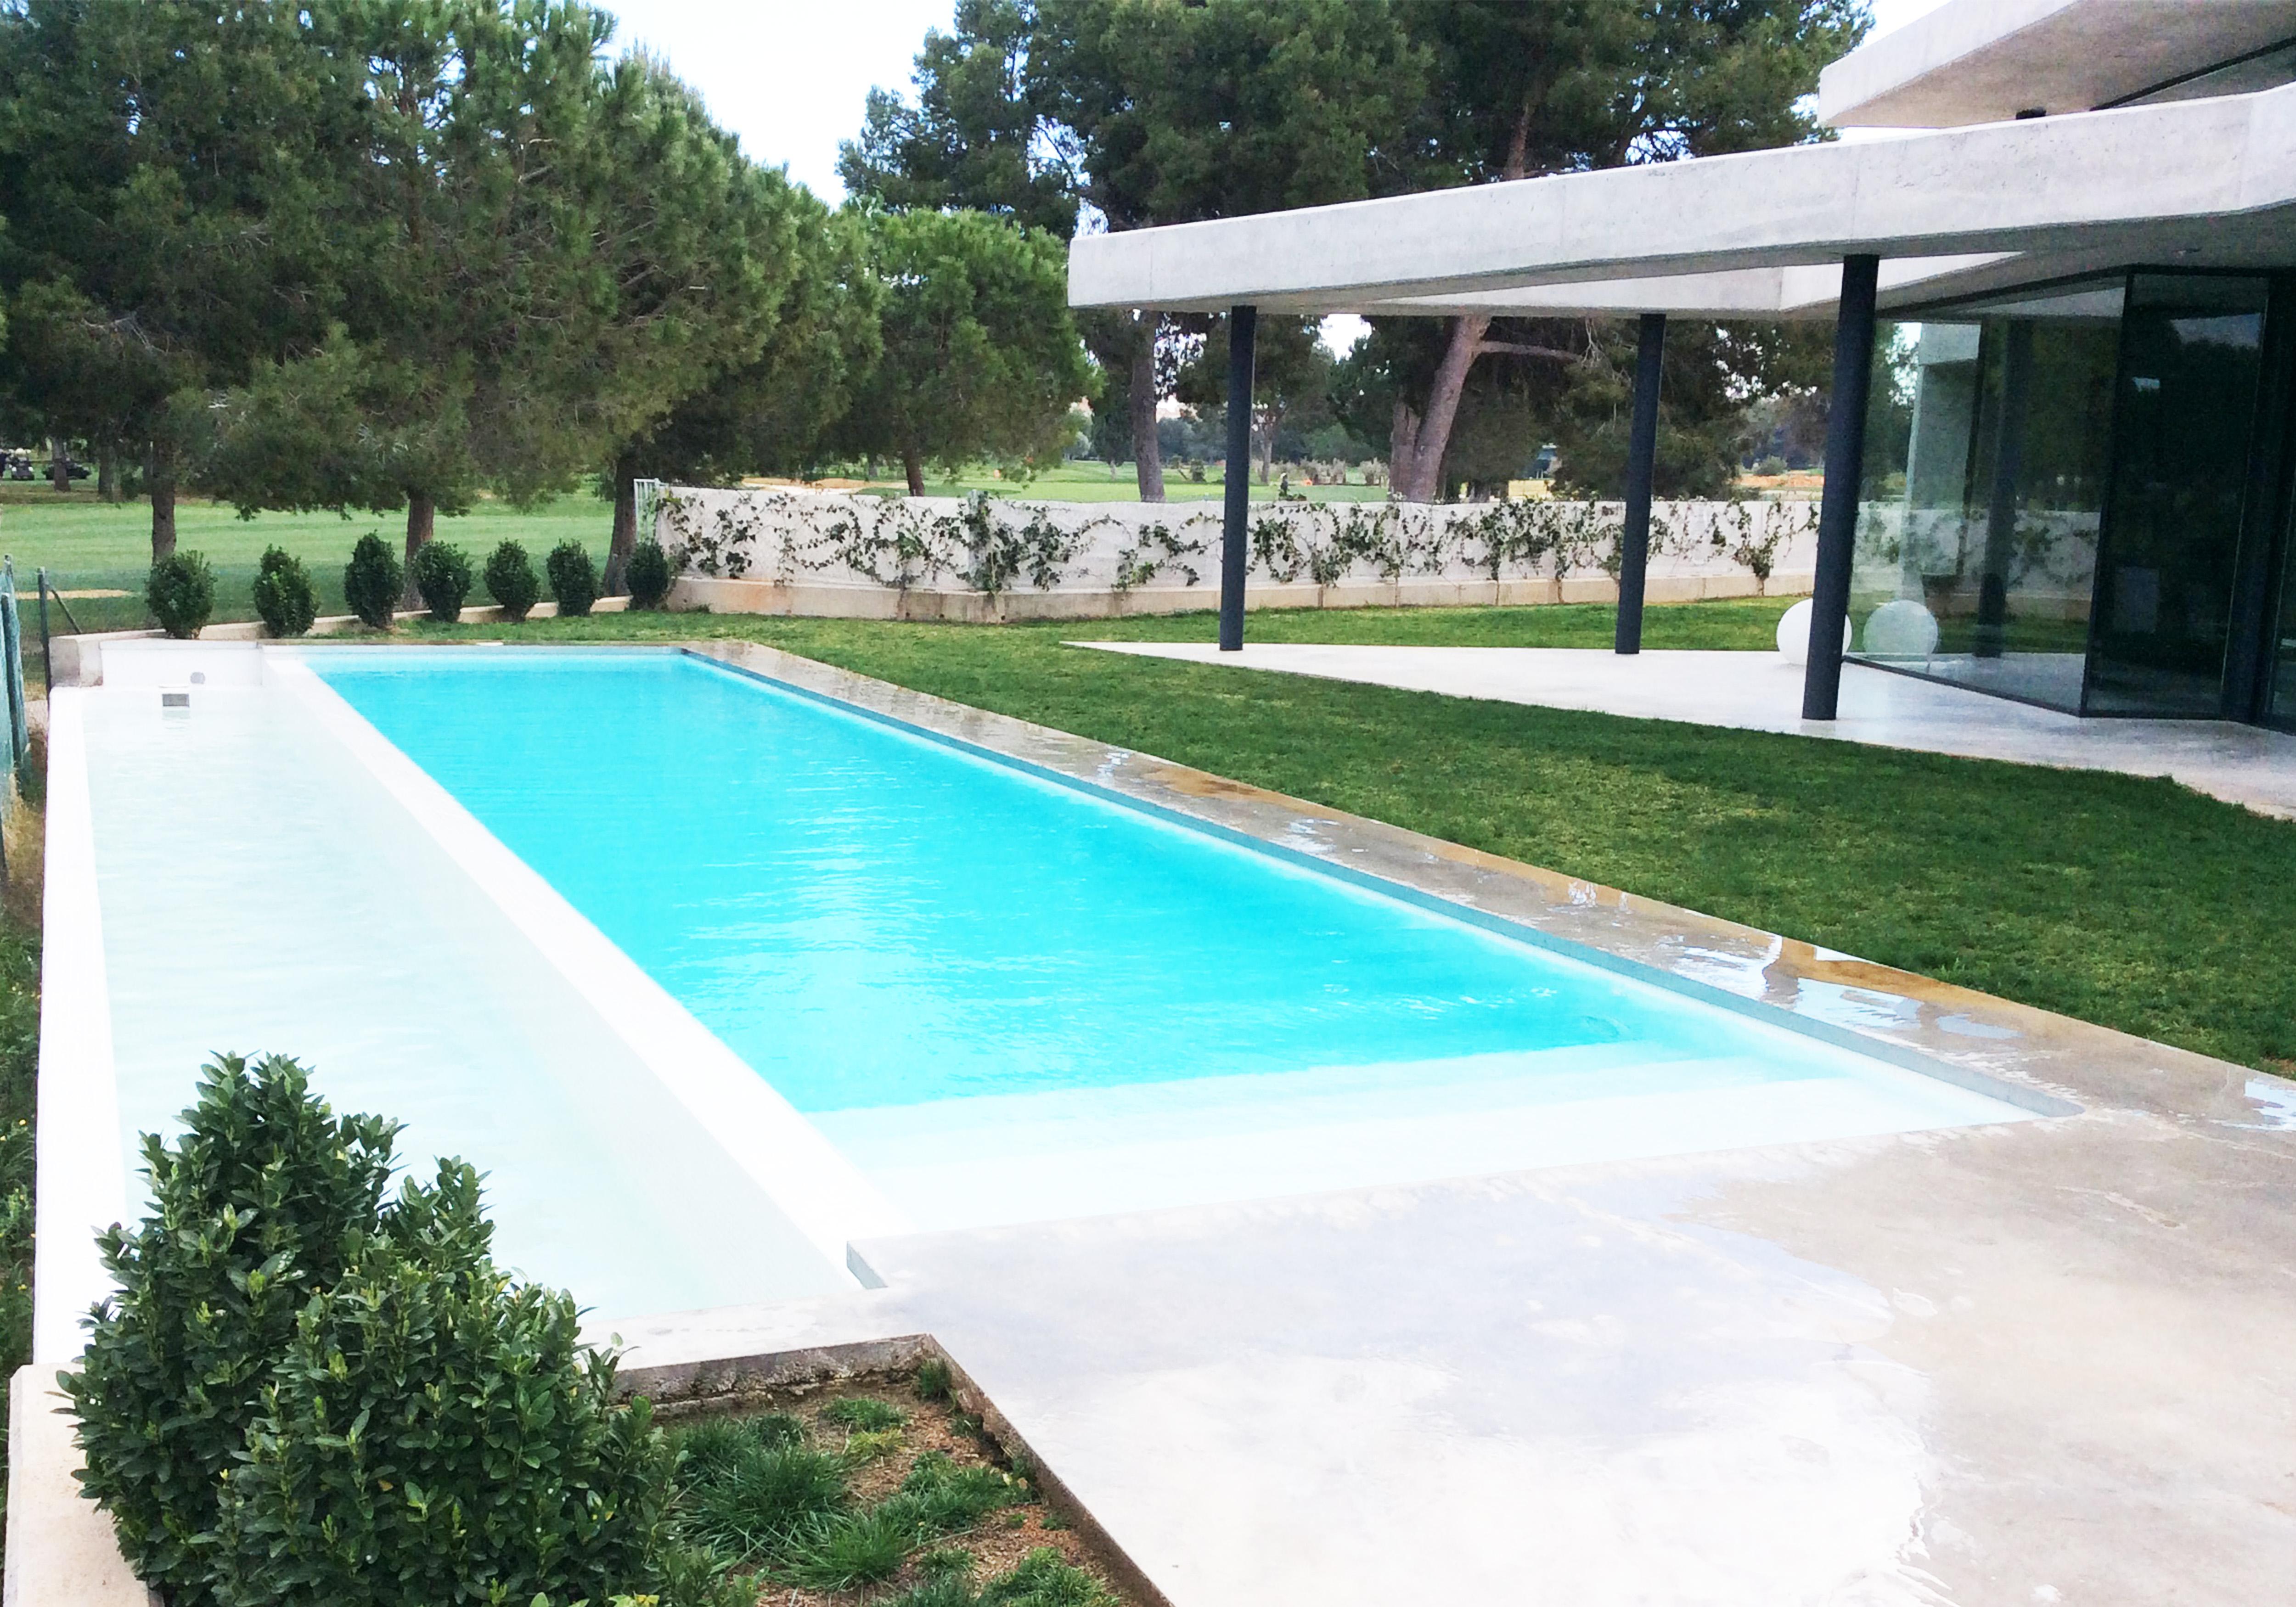 Piscinas desbordantes pisicilimp especialistas en piscinas for Piscina infinita construccion